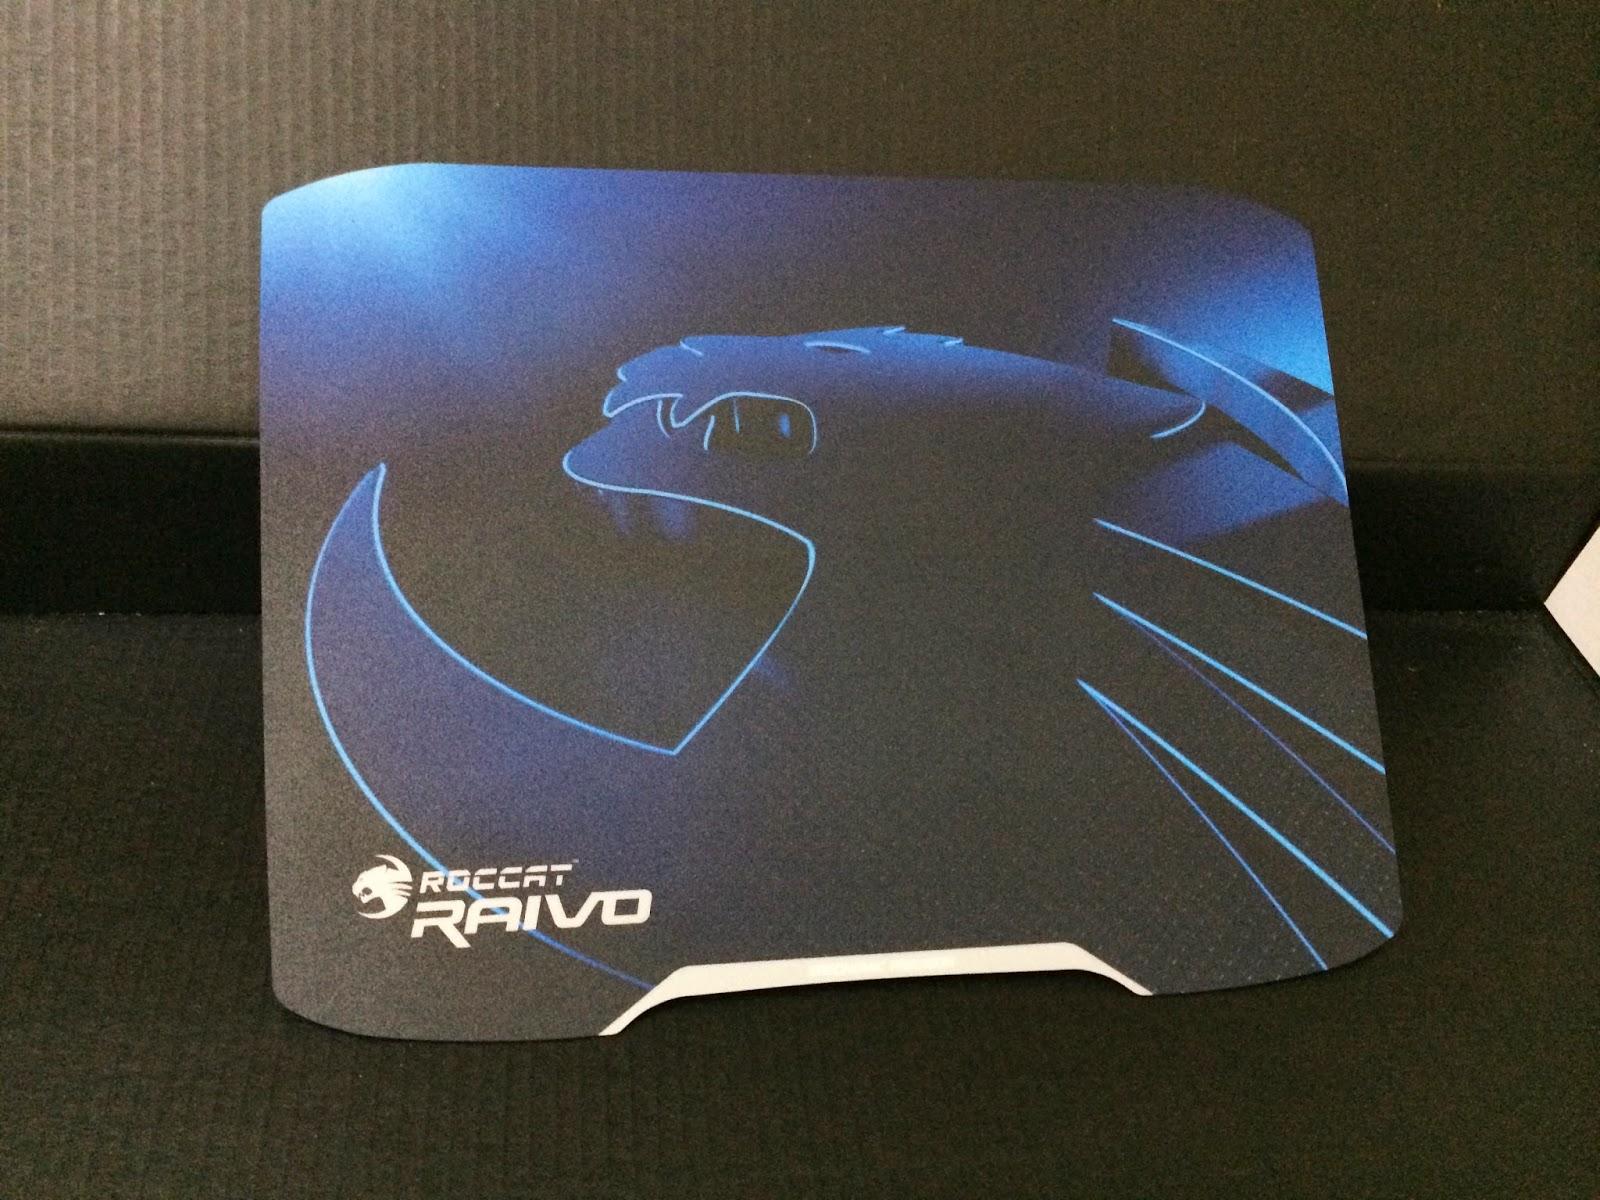 Unboxing & Review - ROCCAT RAIVO 29